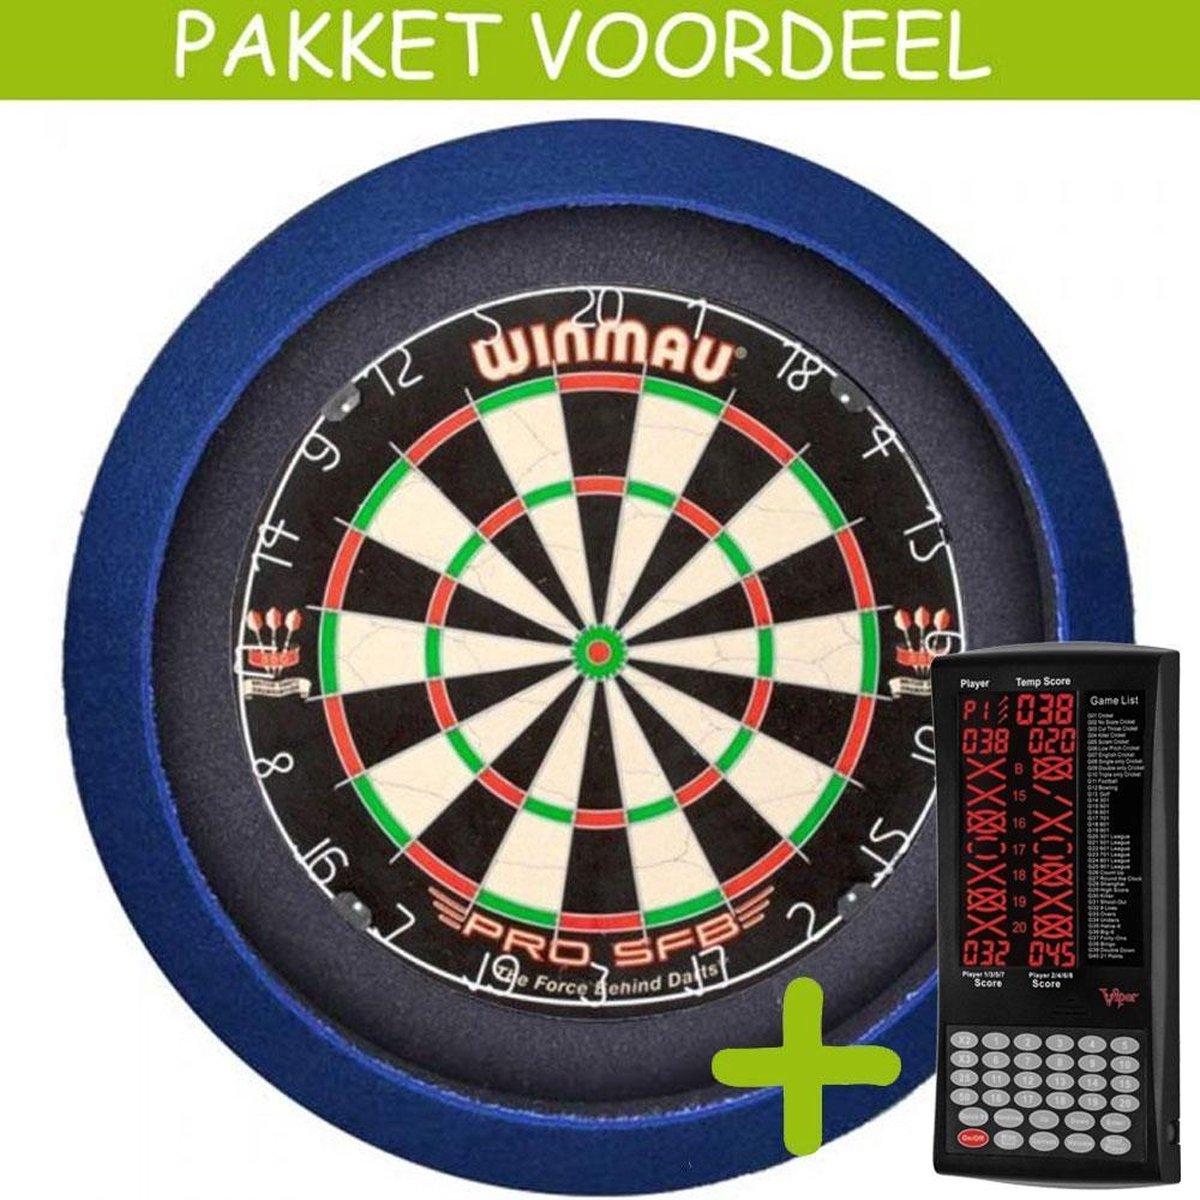 Elektronisch Dart Scorebord VoordeelPakket (Viper ) - Pro SFB - Dartbordverlichting Basic (Blauw)